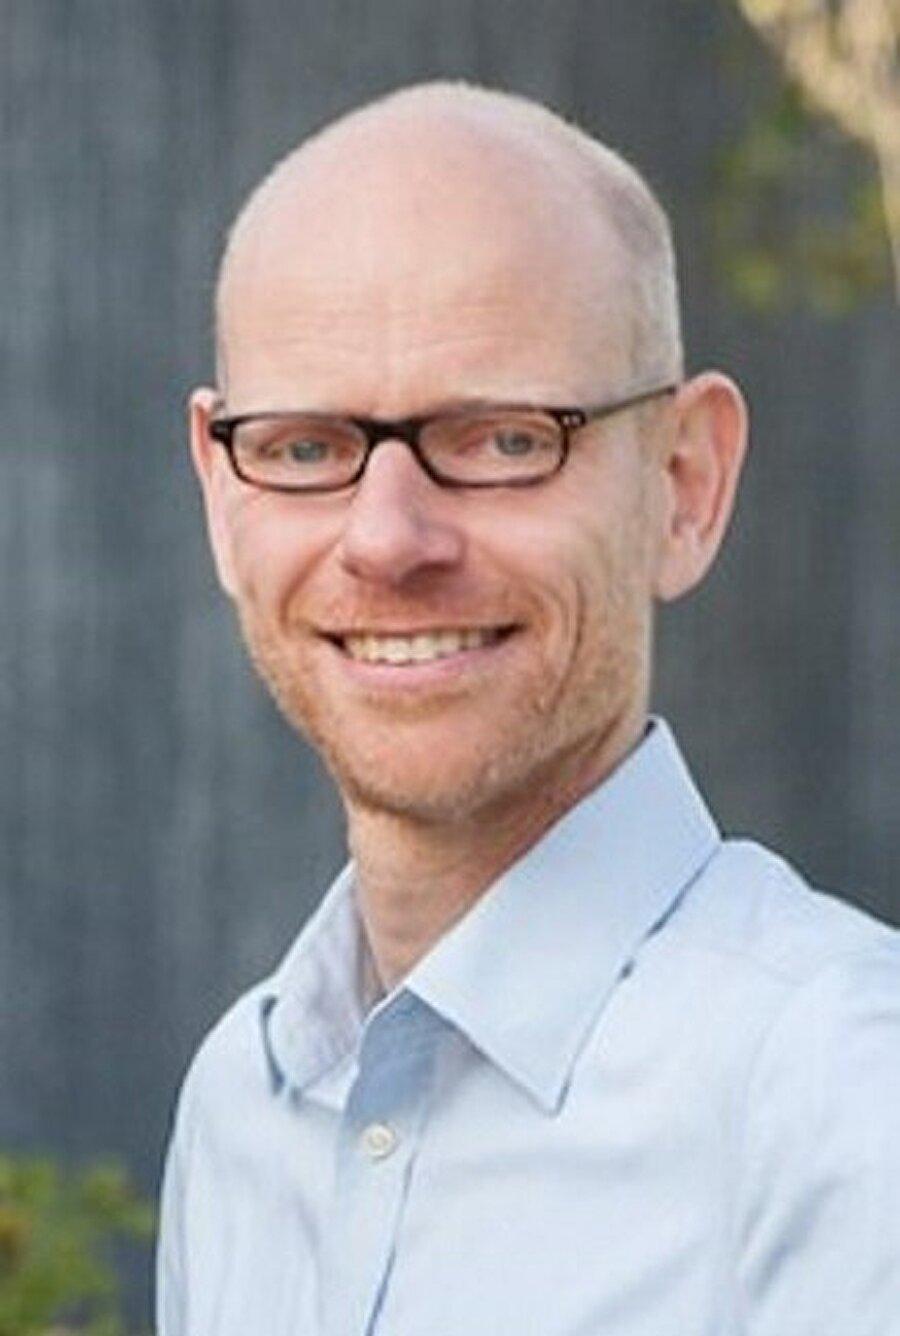 Niklas Höhne